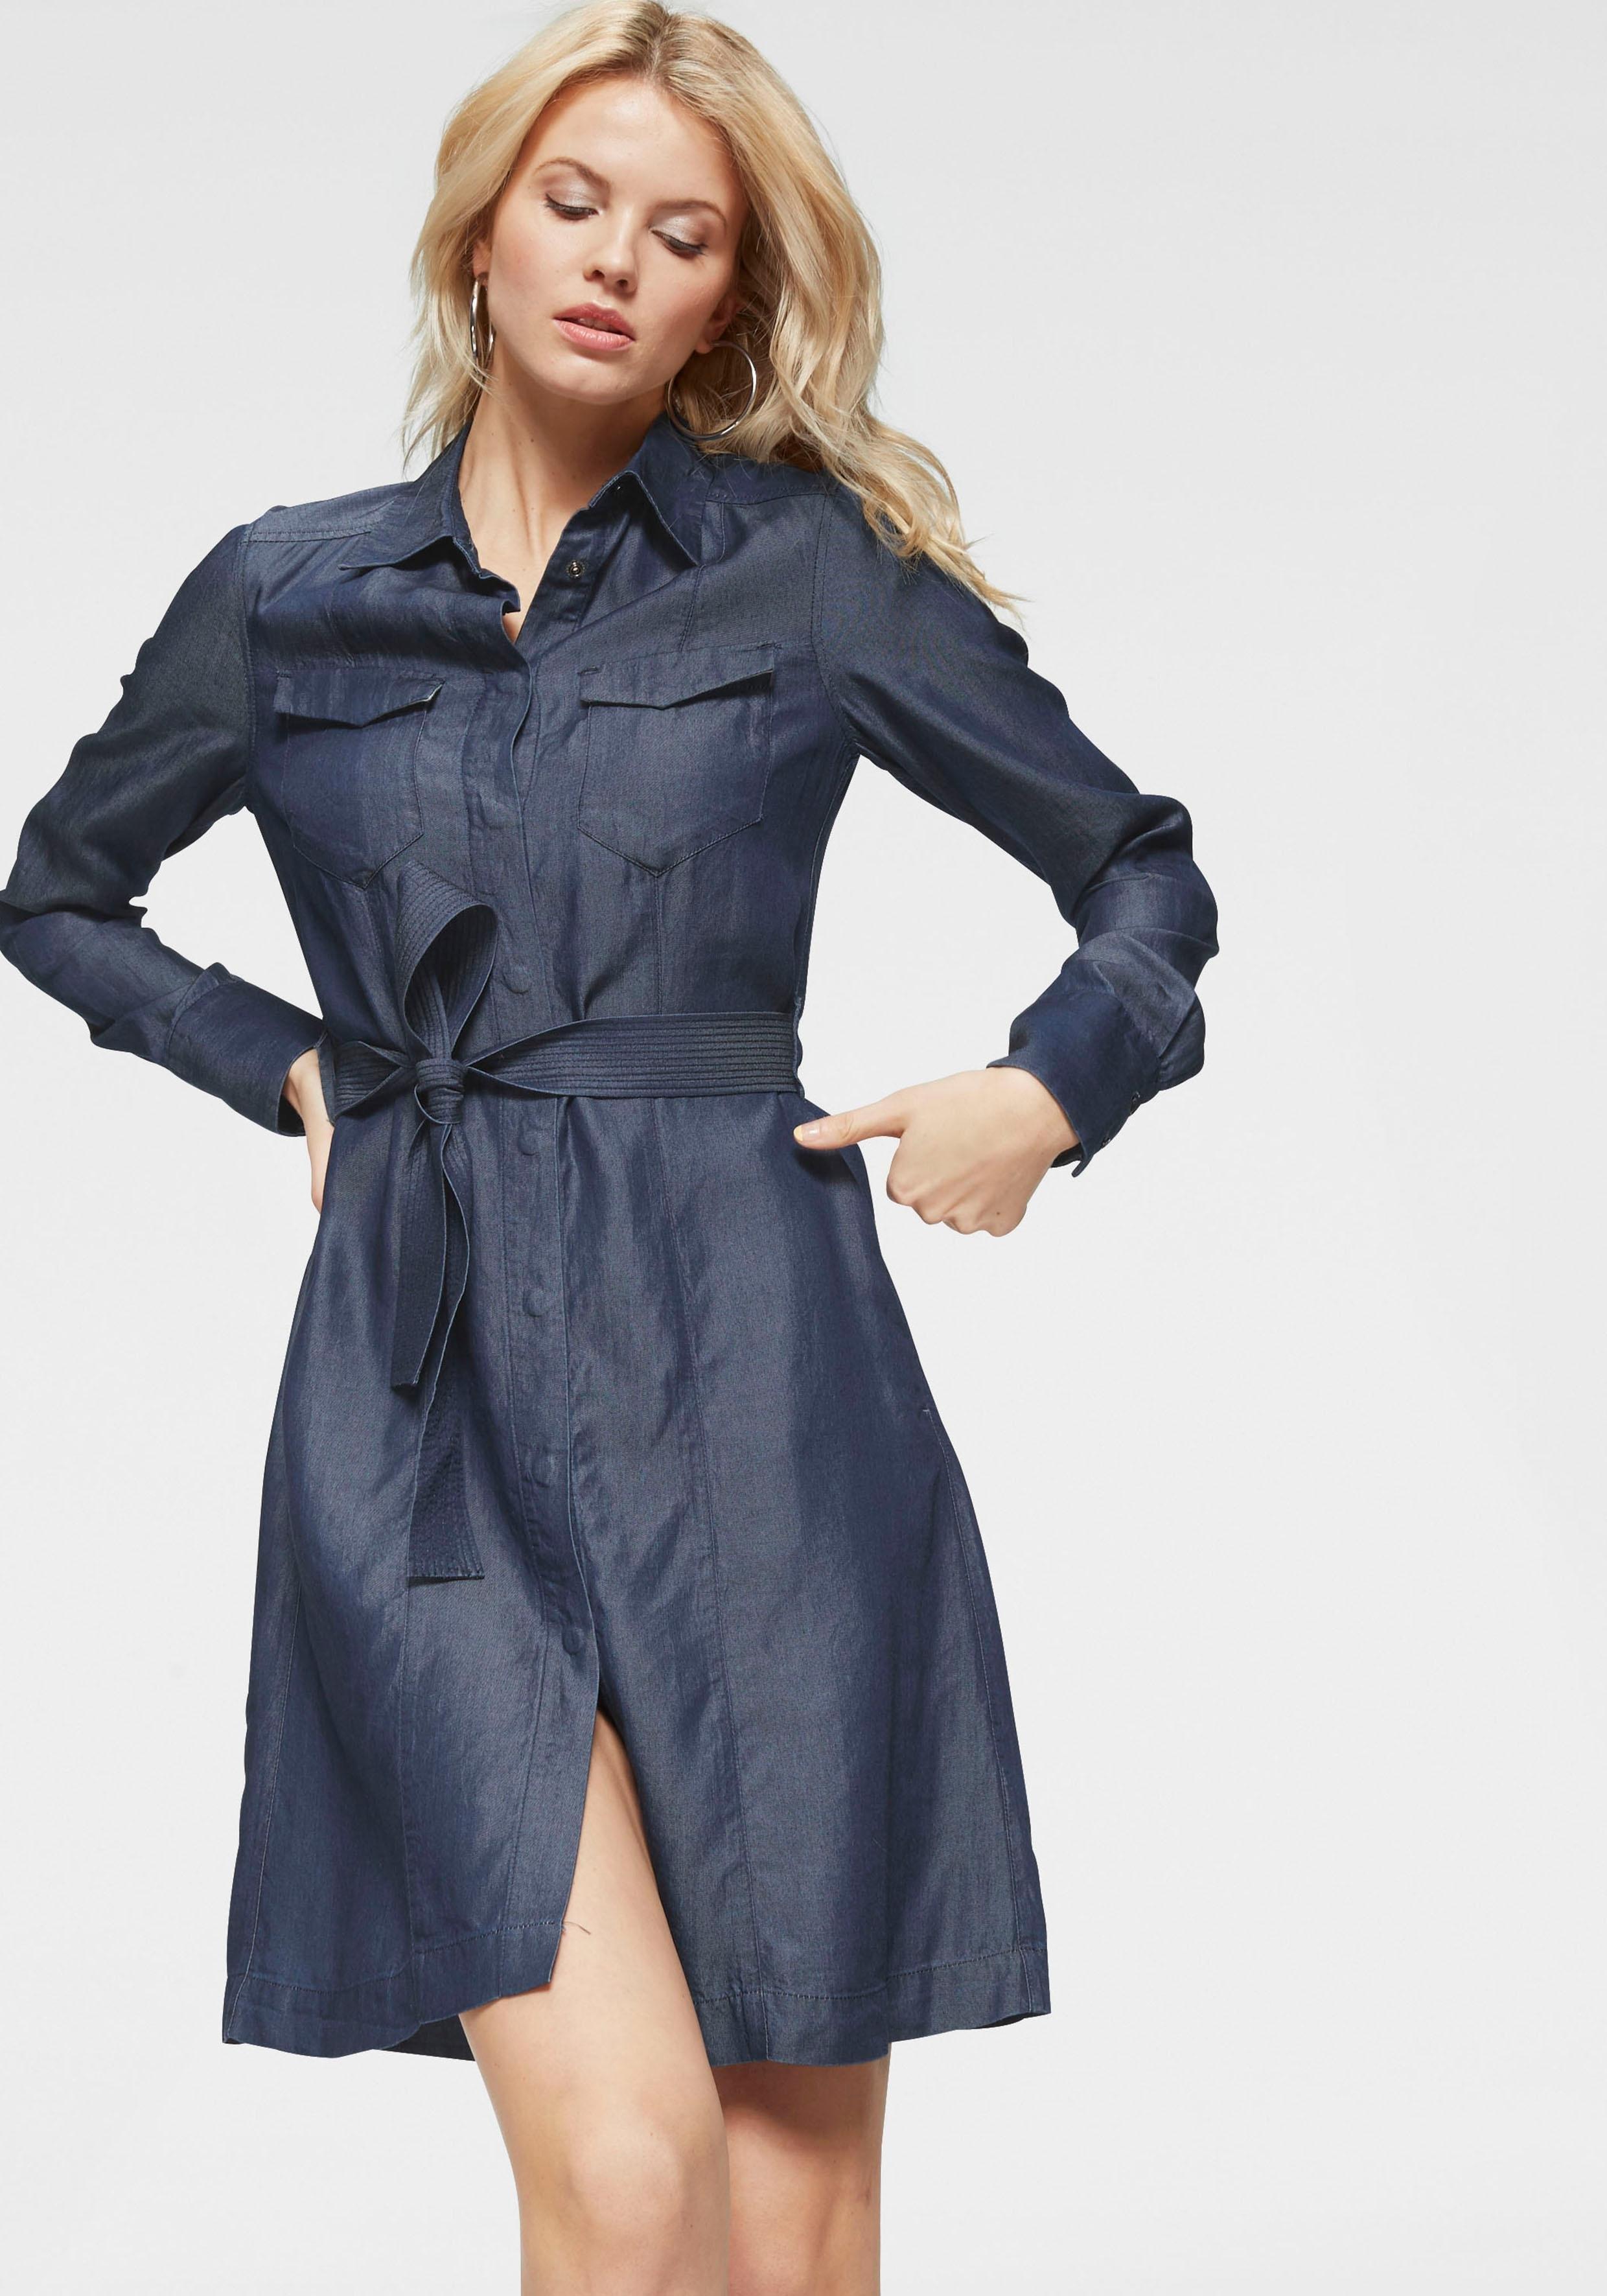 G-star Raw jeansjurk »Tacoma straight shirt dress« bij OTTO online kopen